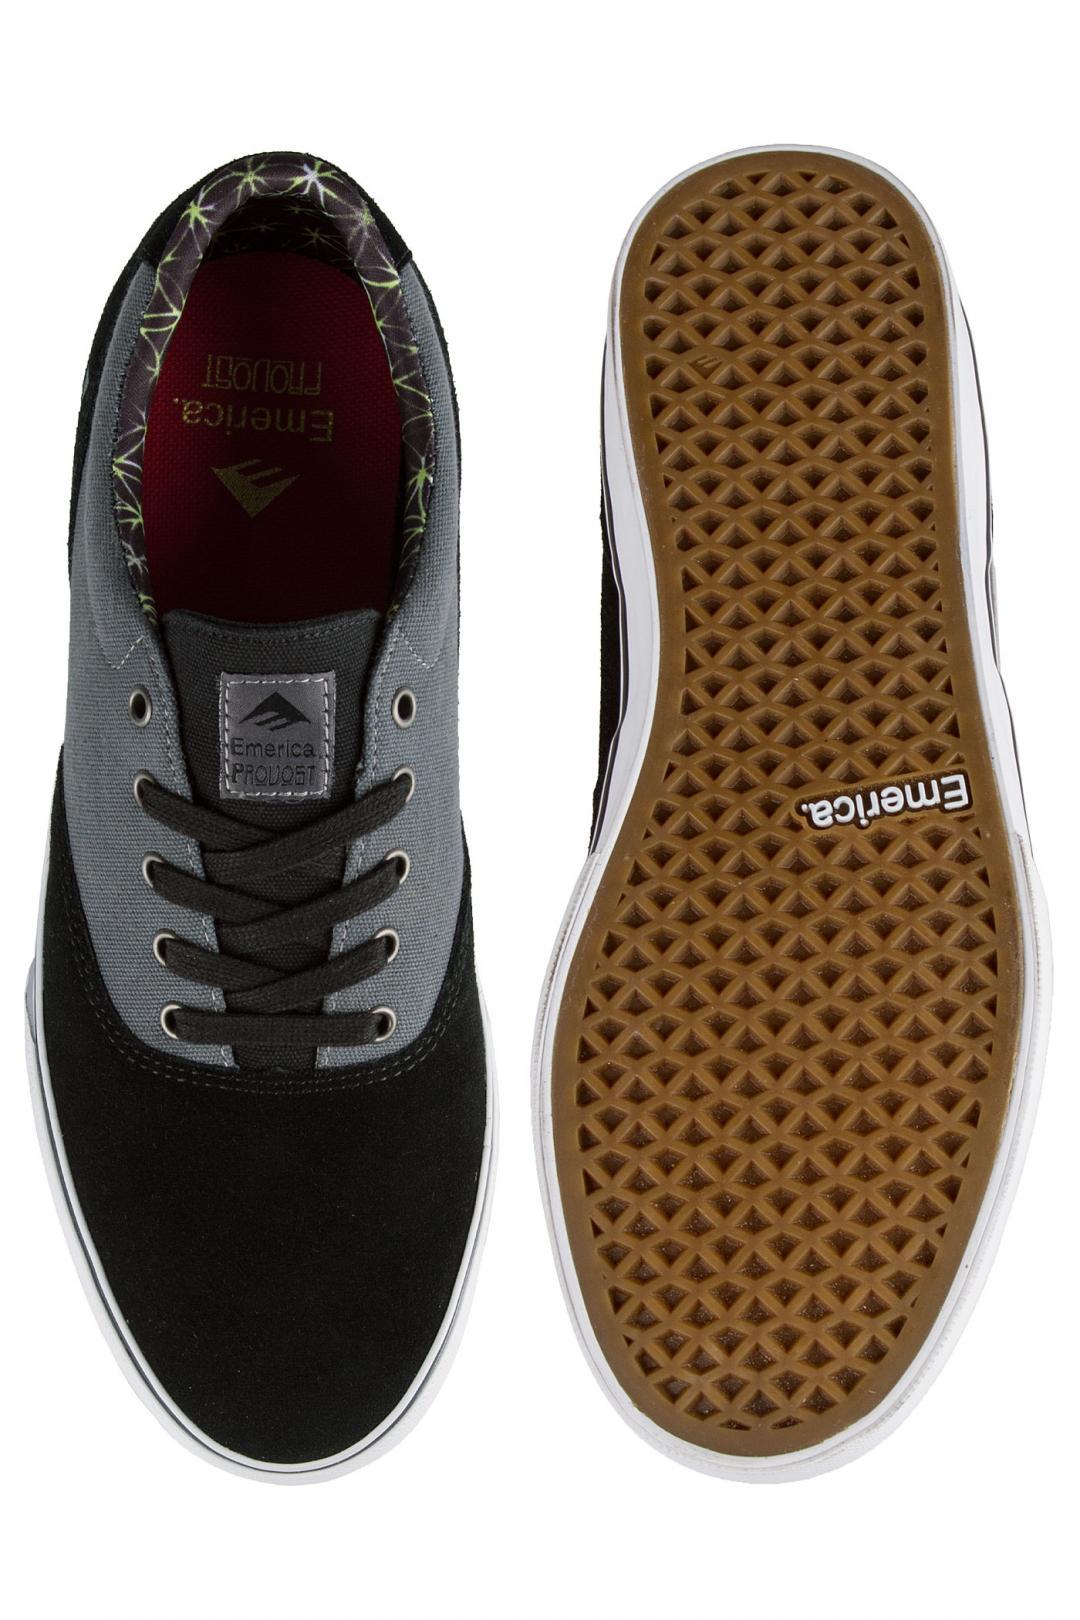 Uomo Emerica The Provost Slim Vulc black grey white | Sneaker